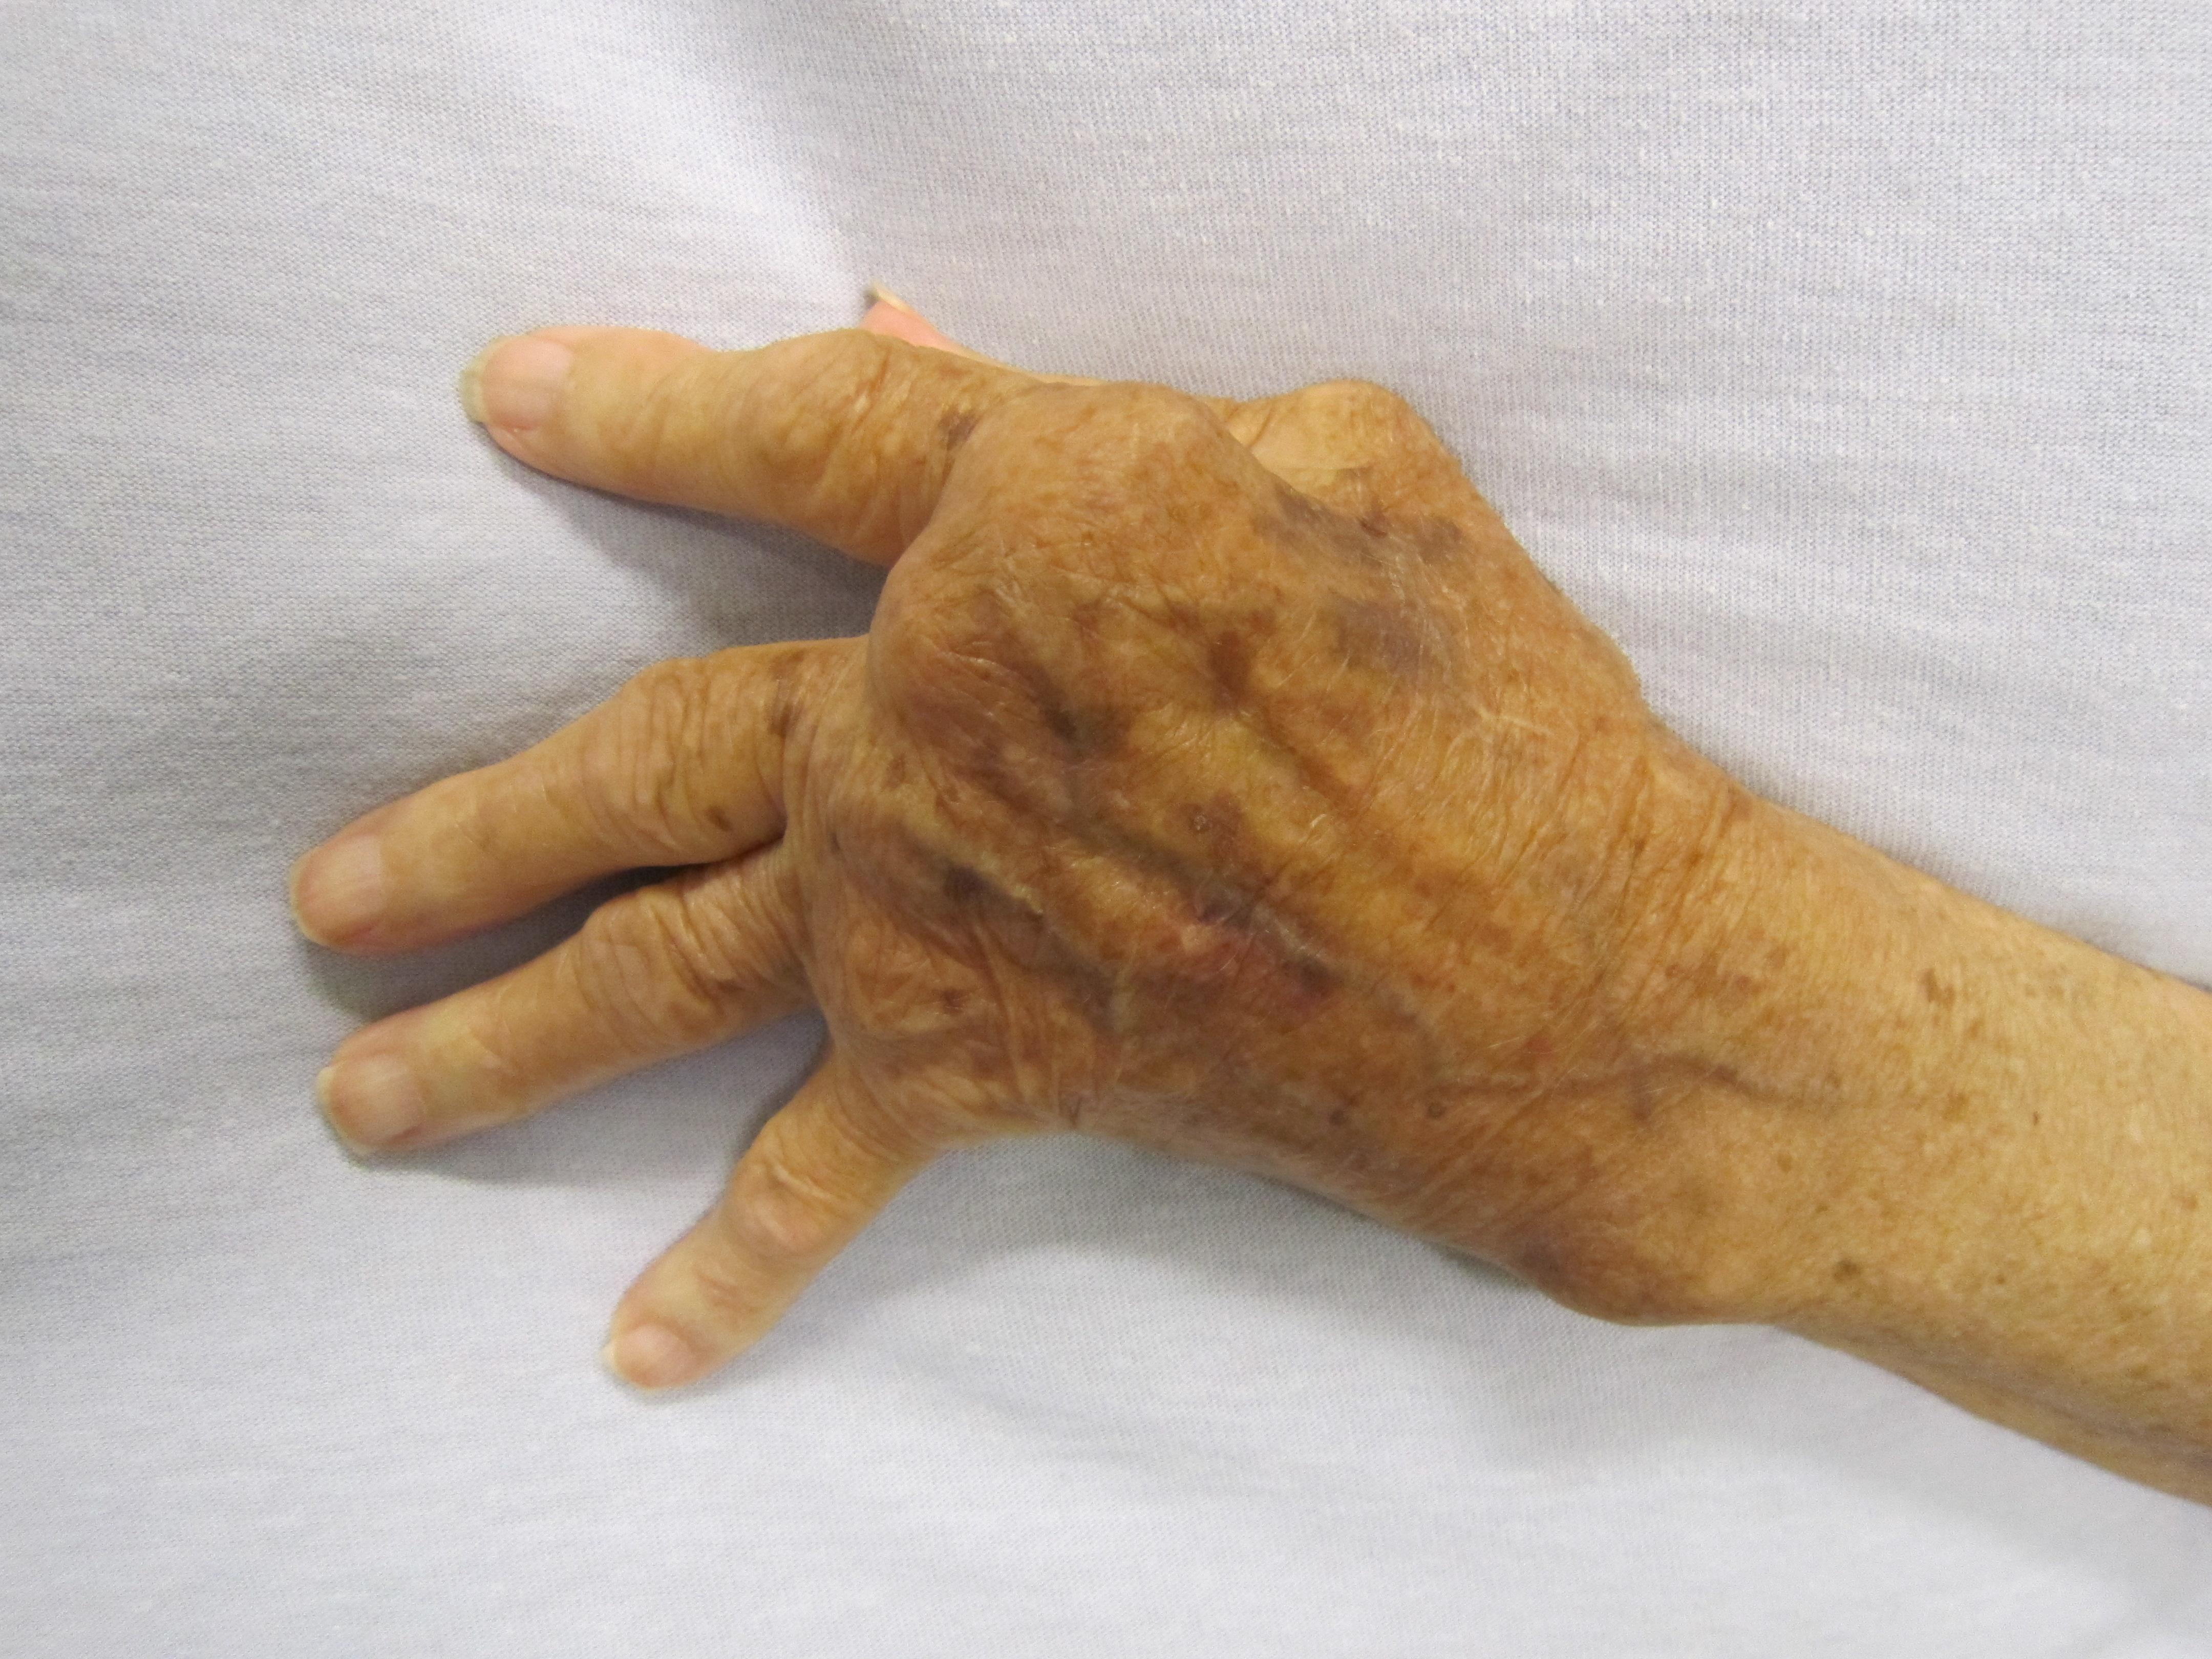 rheumatoid arthritis a kezén)